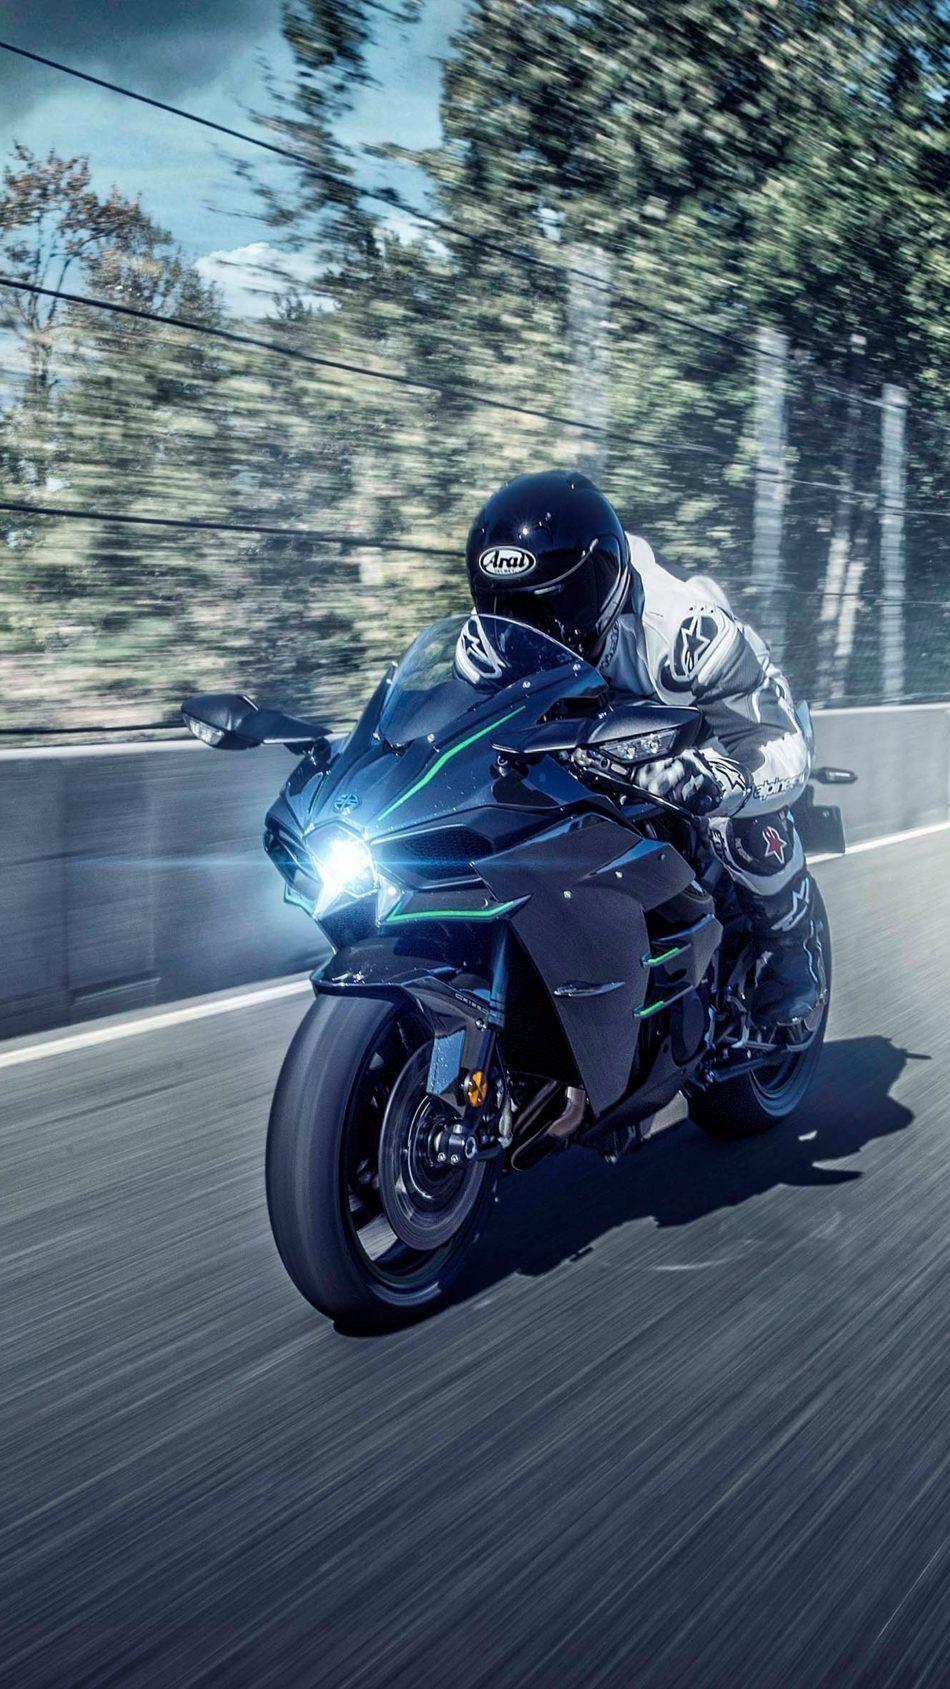 Kawasaki Ninja H2 Speed Racing Kawasaki ninja, Kawasaki